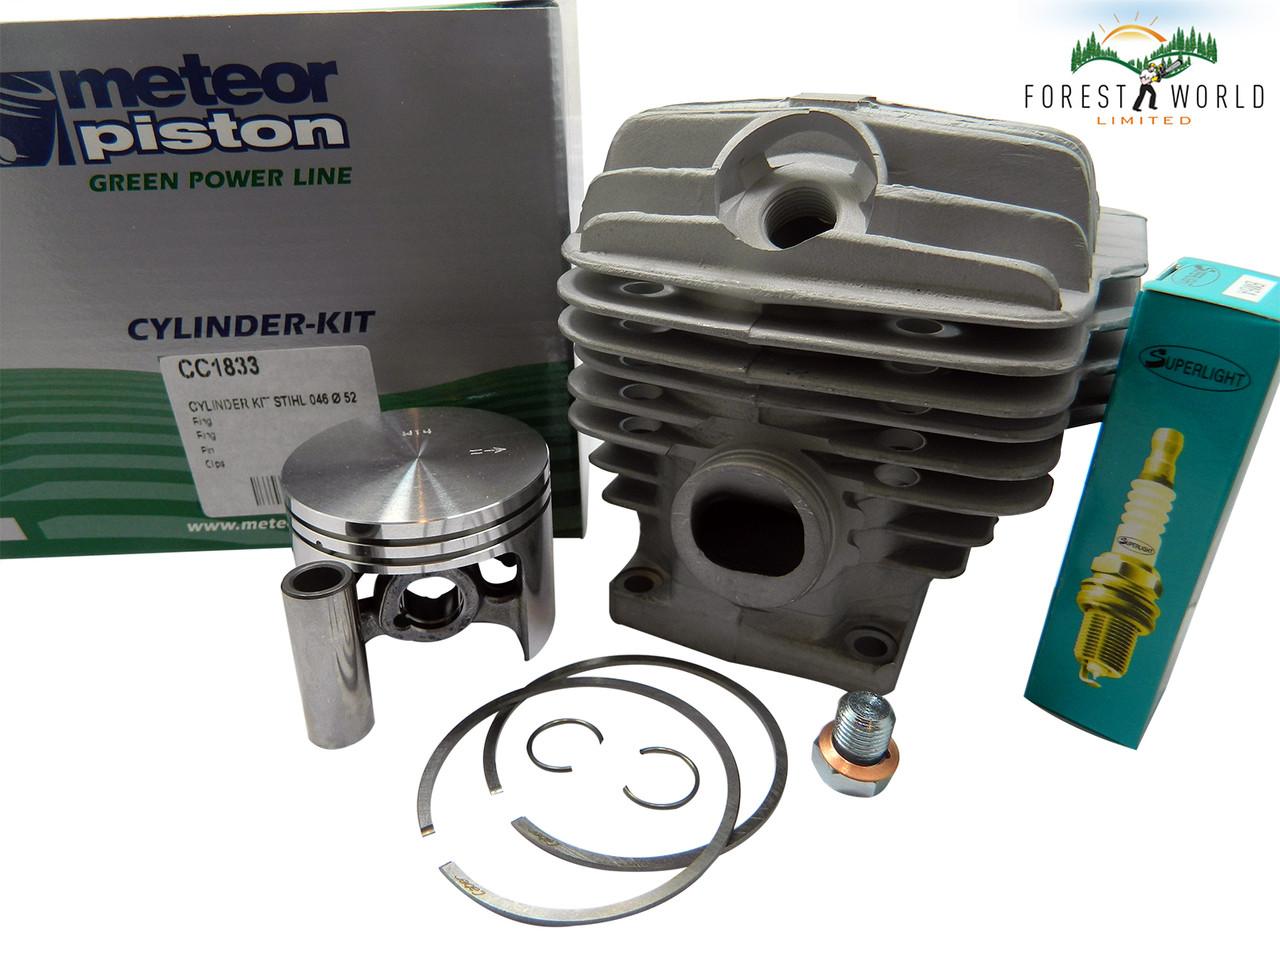 MS460 Cylinder Kit Stihl 046 Cylinder /& Piston Rebuild Kit New aftermarket